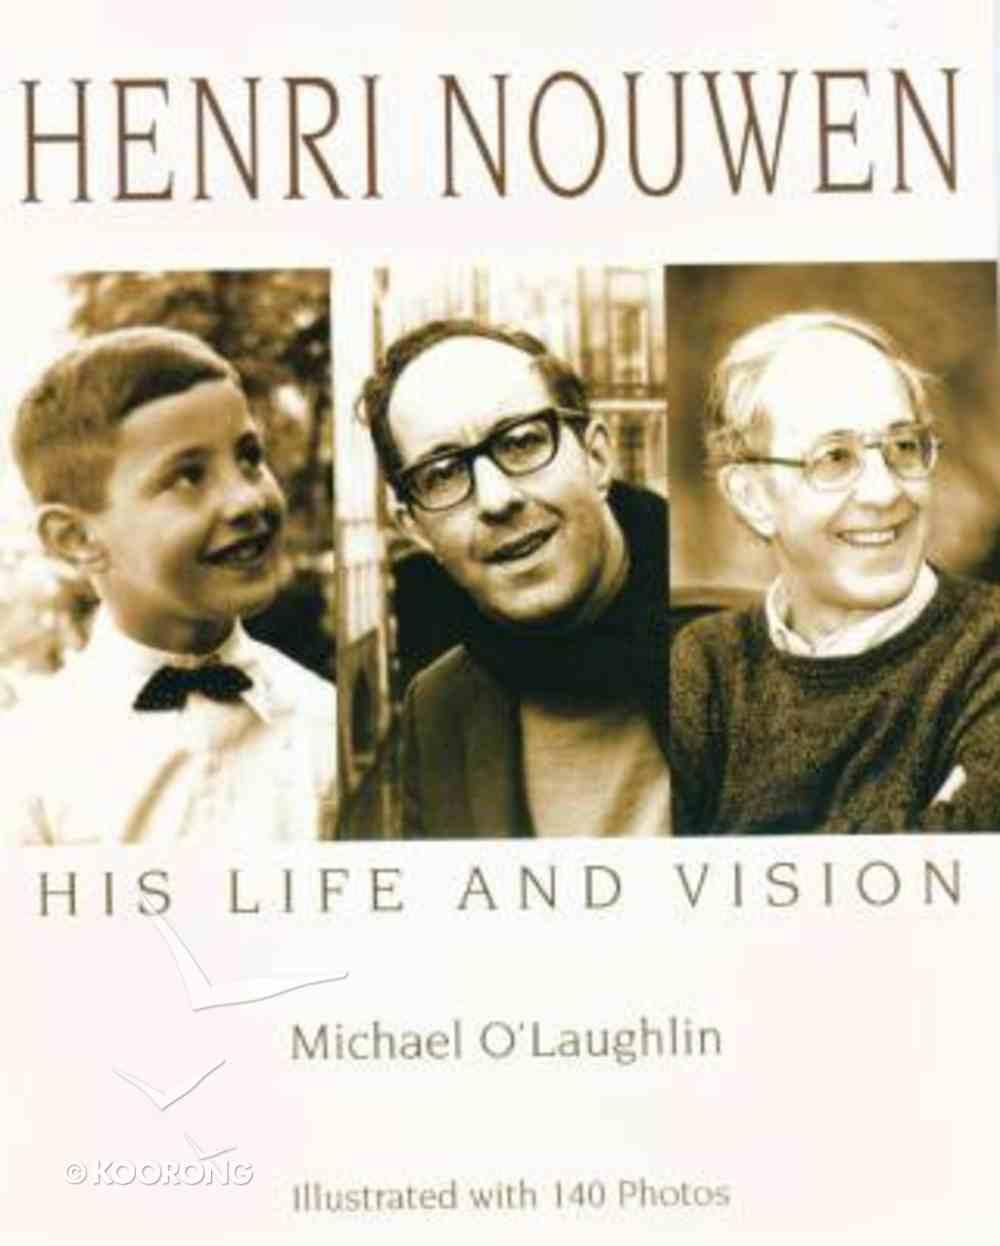 Henri Nouwen: His Life and Vision Paperback